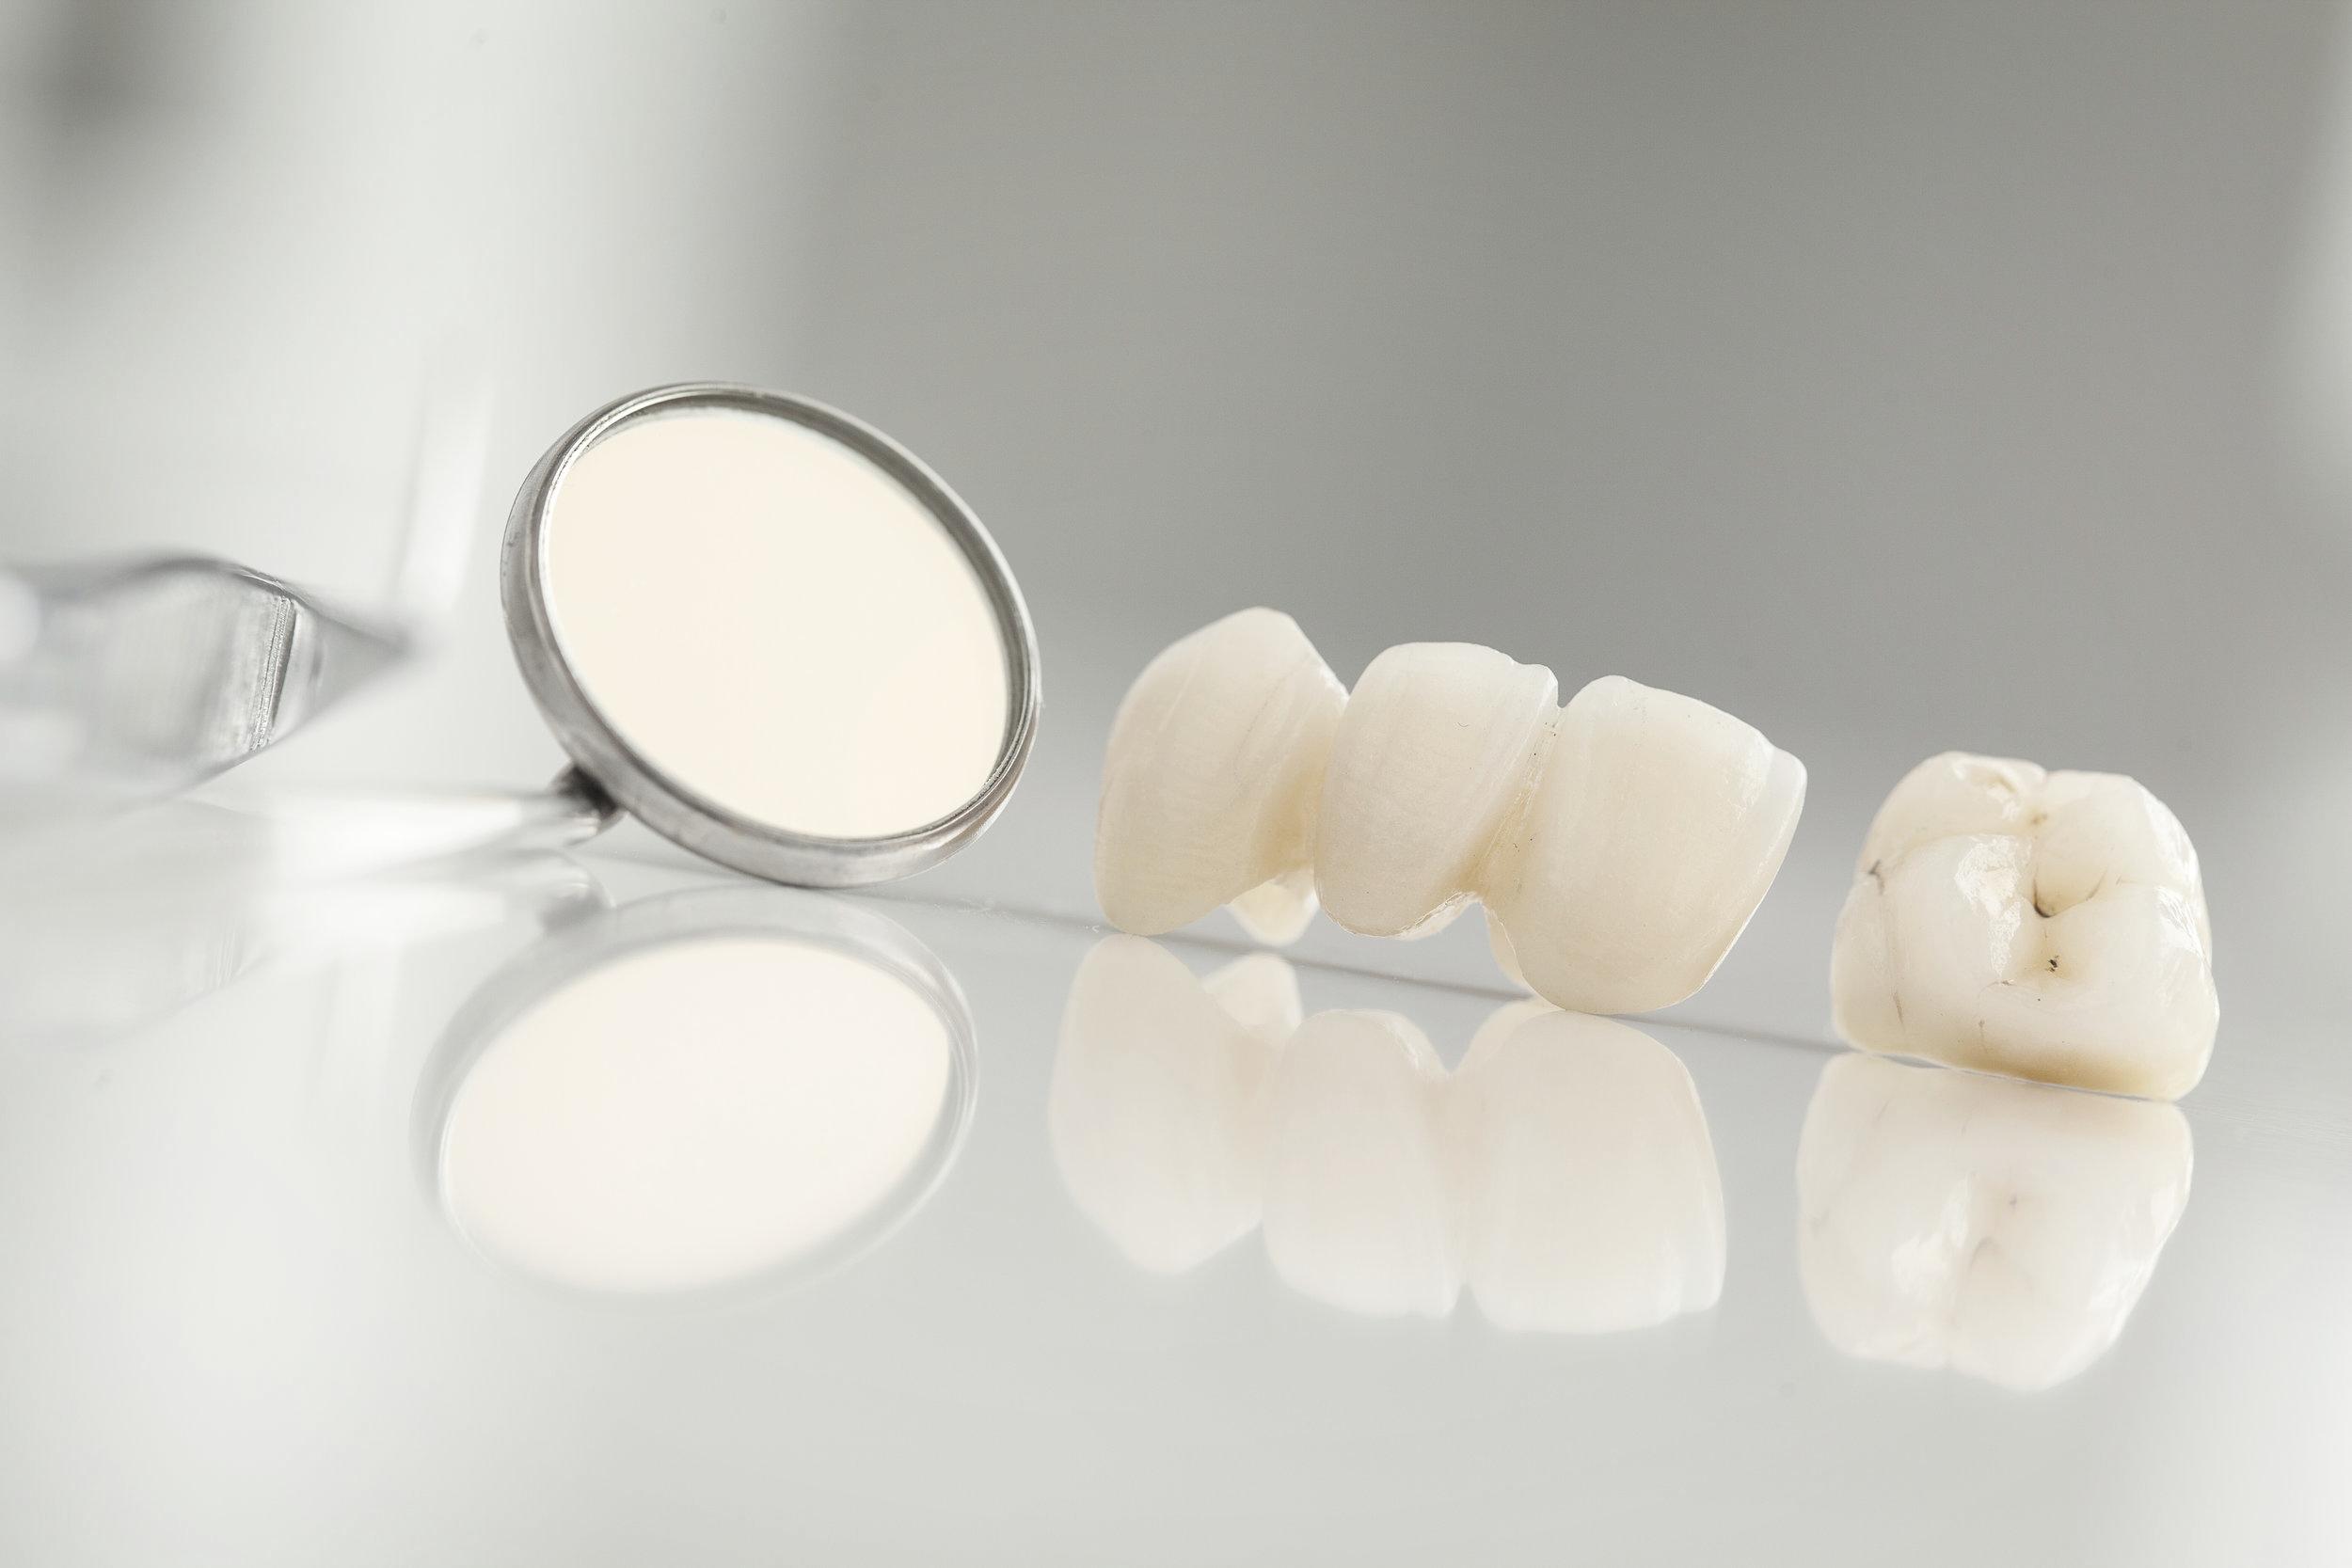 Dental Crowns in dental tray